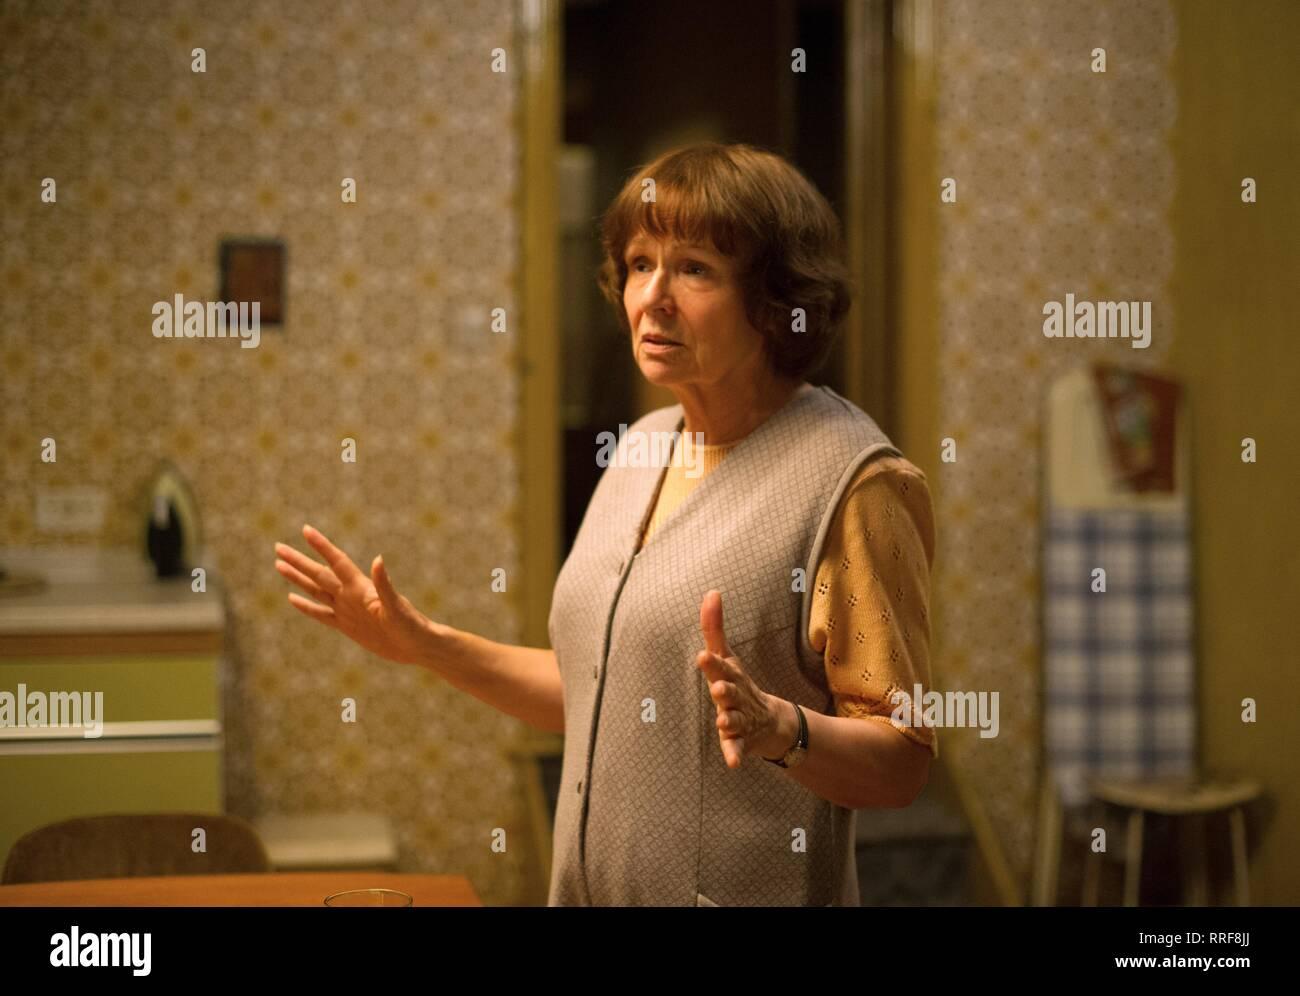 FILM STARS DON'T DIE IN LIVERPOOL, JULIE WALTERS, 2017 - Stock Image